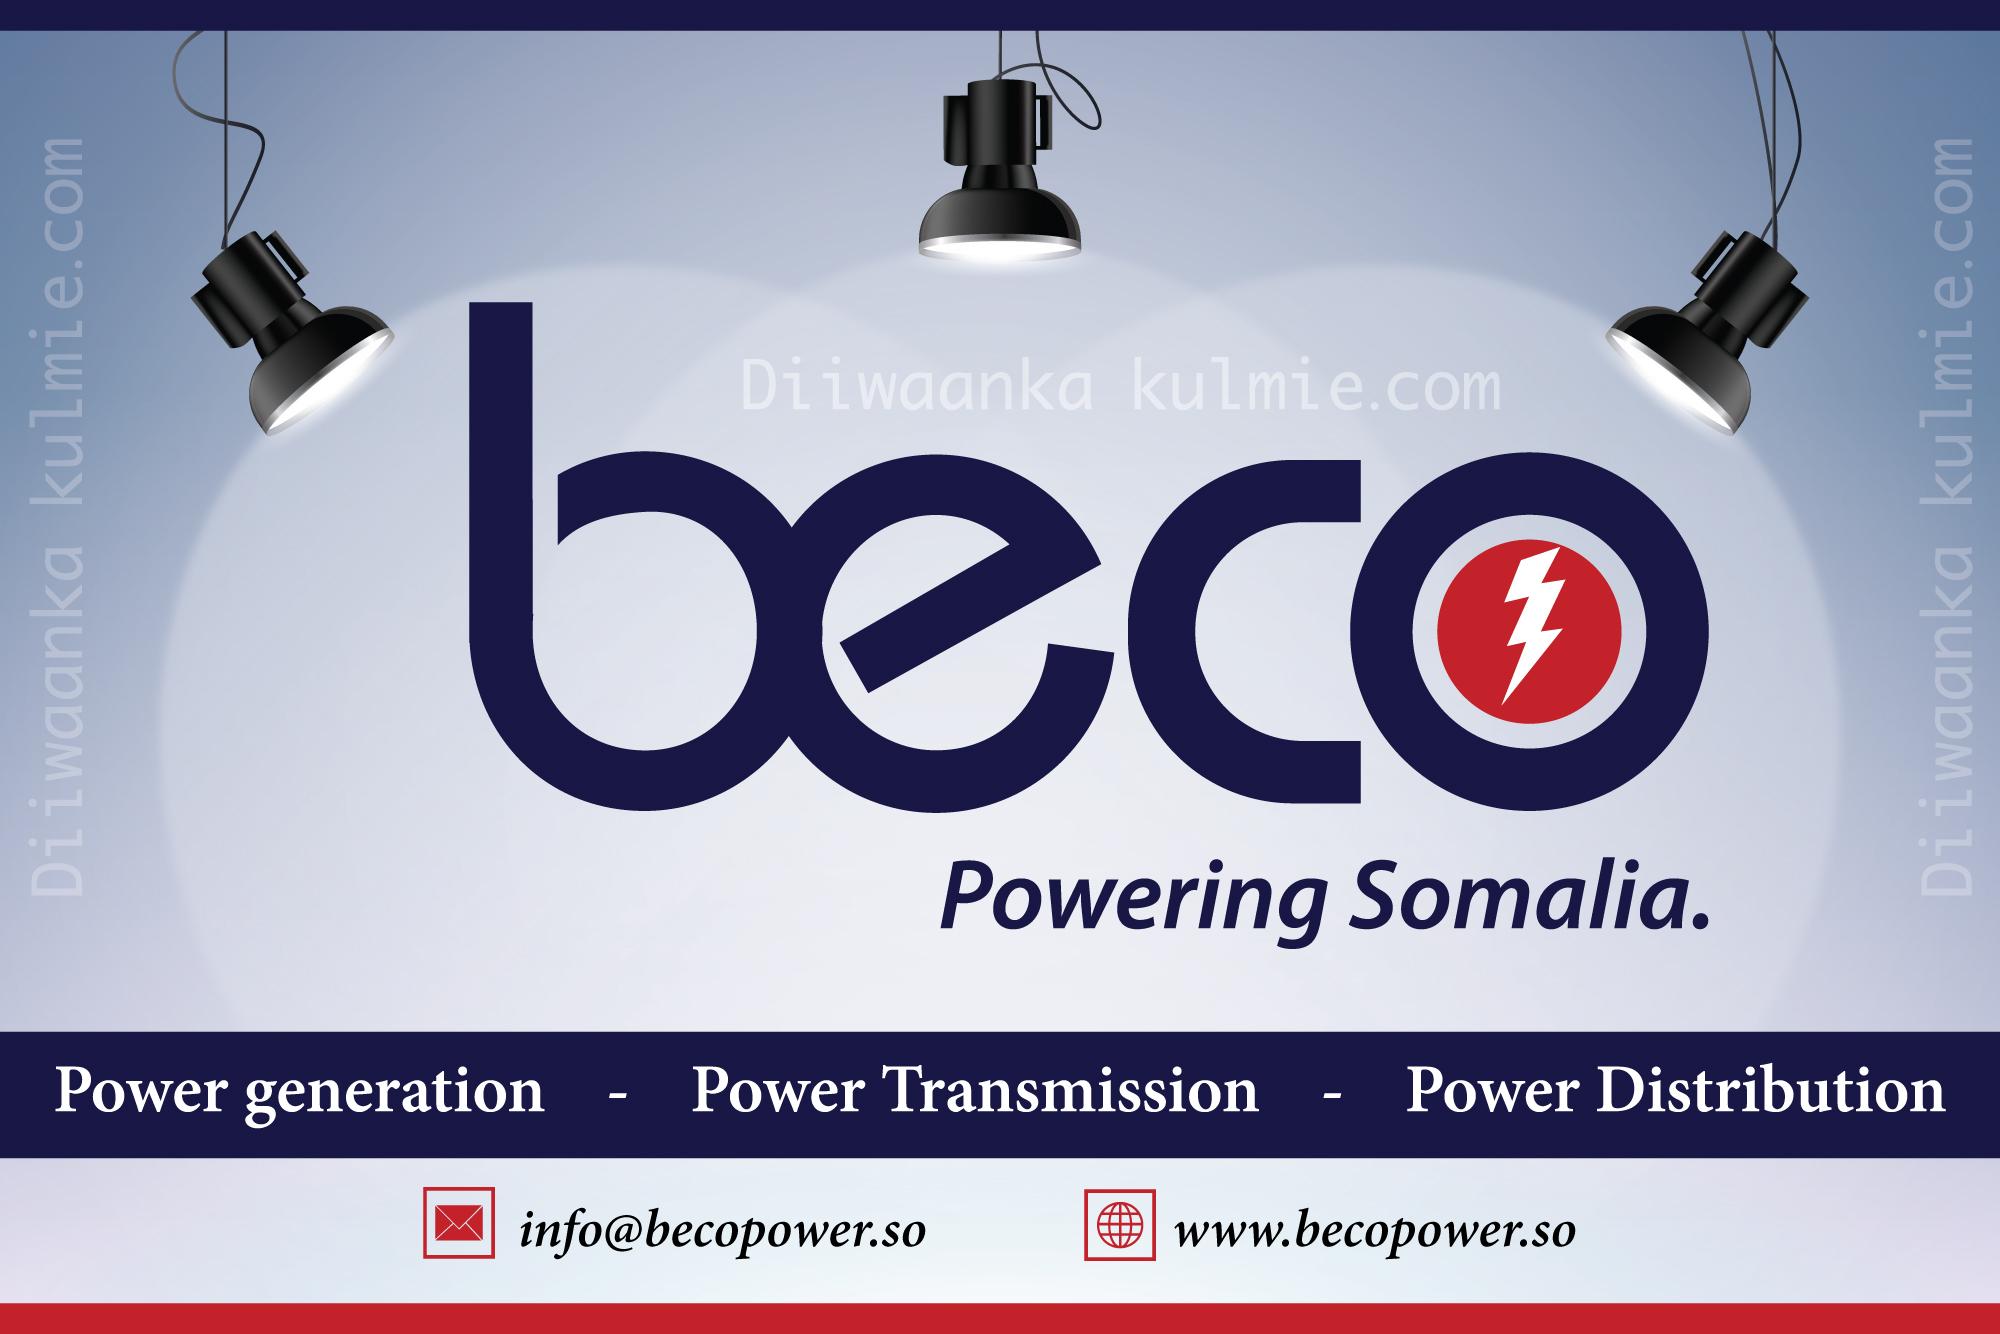 beco-somalia